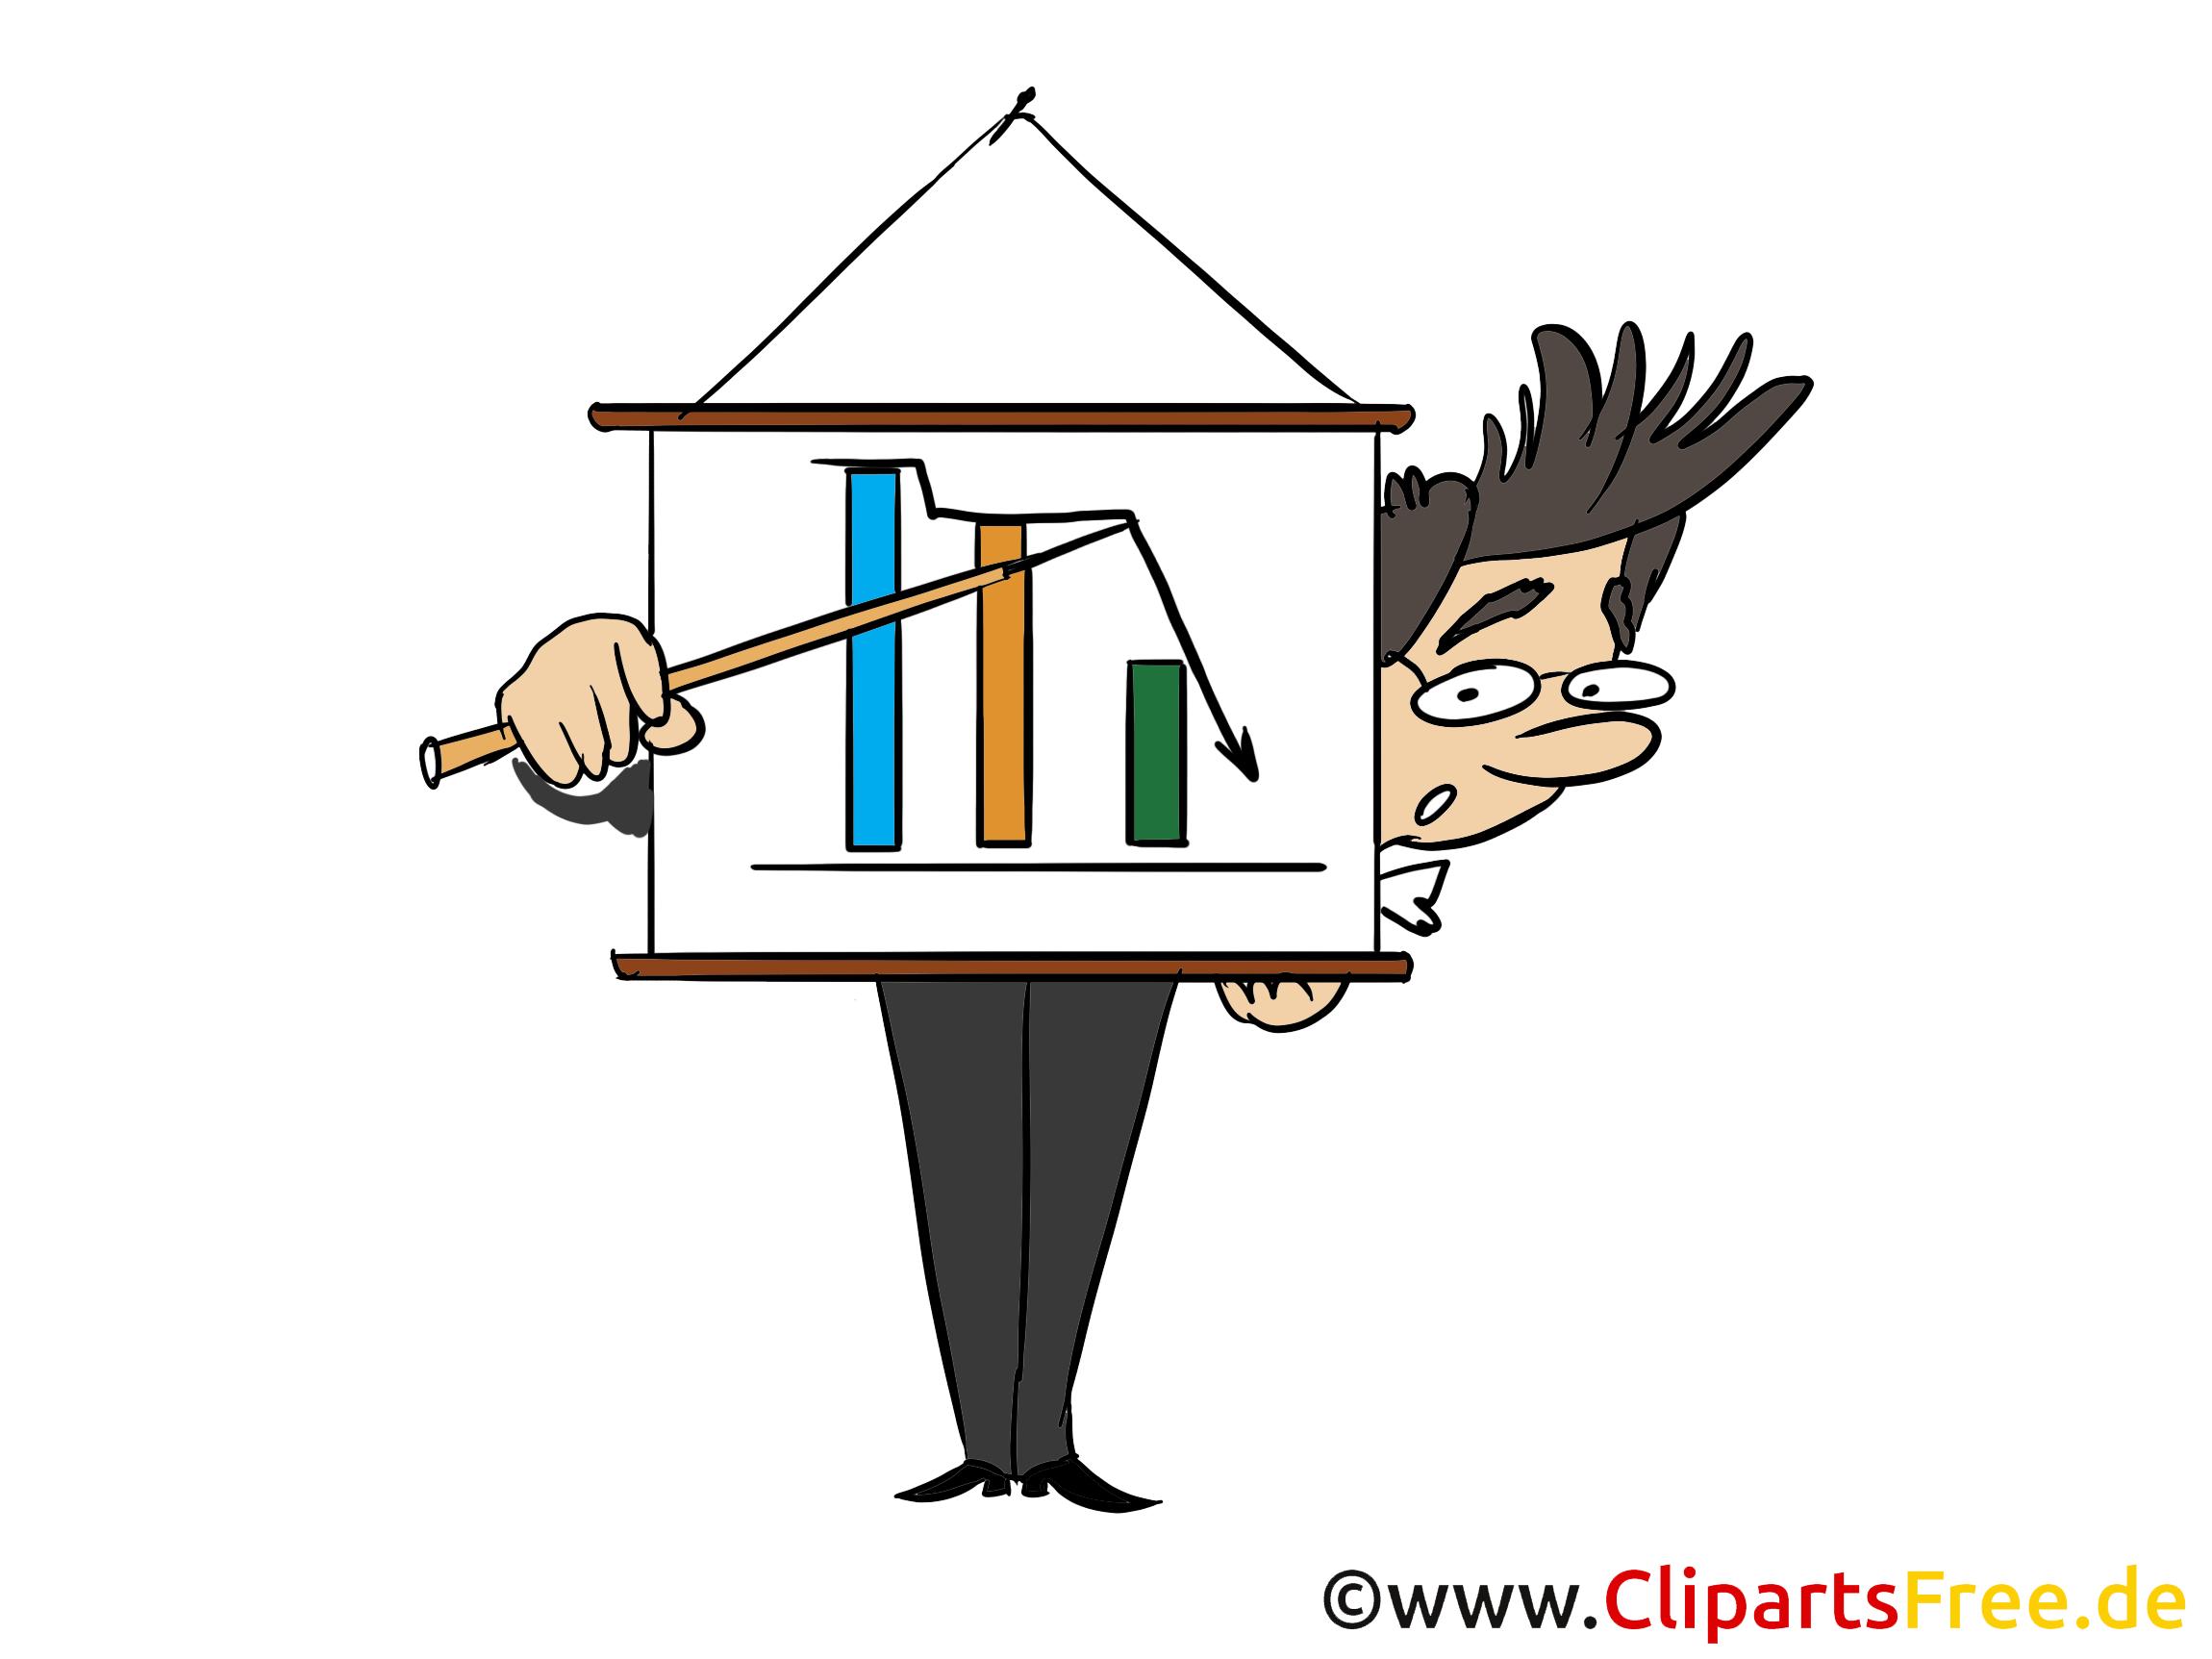 Verkaufsberater Bild, Clipart, Grafik, Cartoon, Illustration